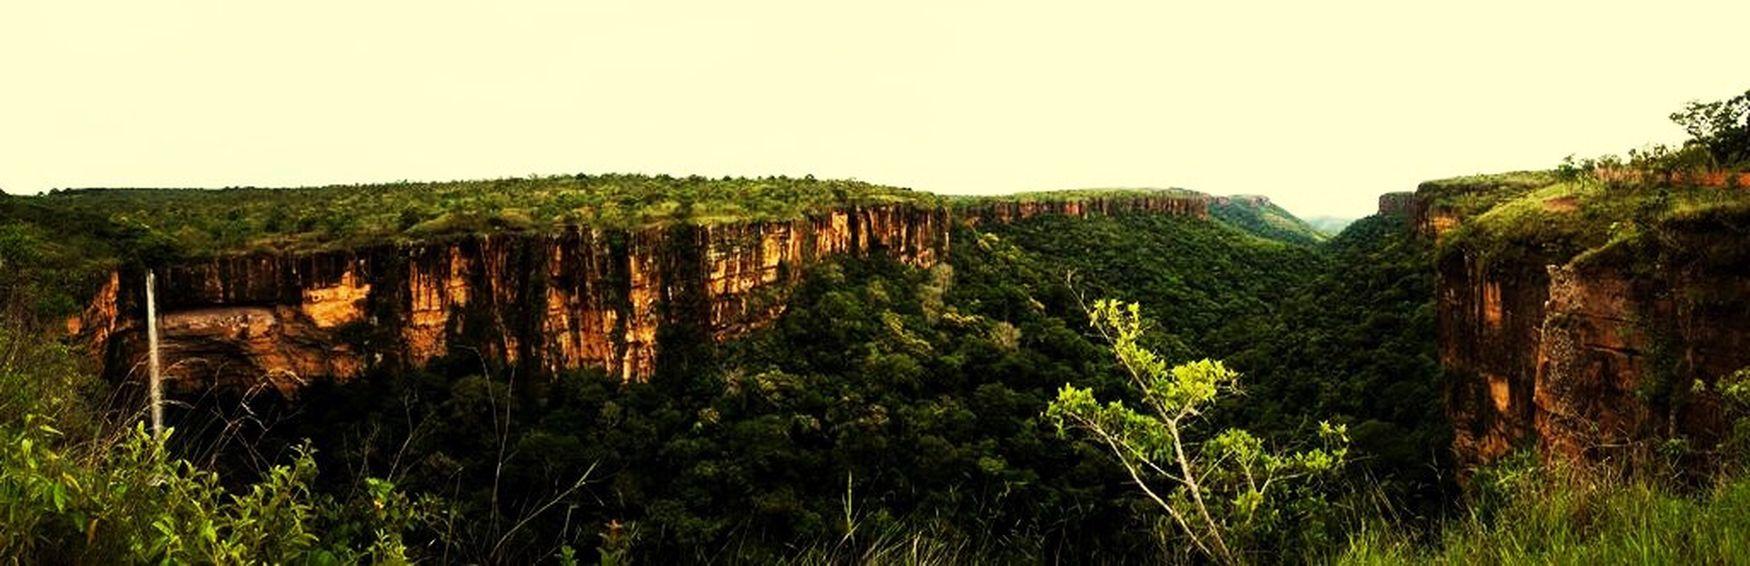 Cerrado Brazil Chapadadosguimaraes Veudenoiva EyeEm Best Shots Panoramic Photography Panorámica